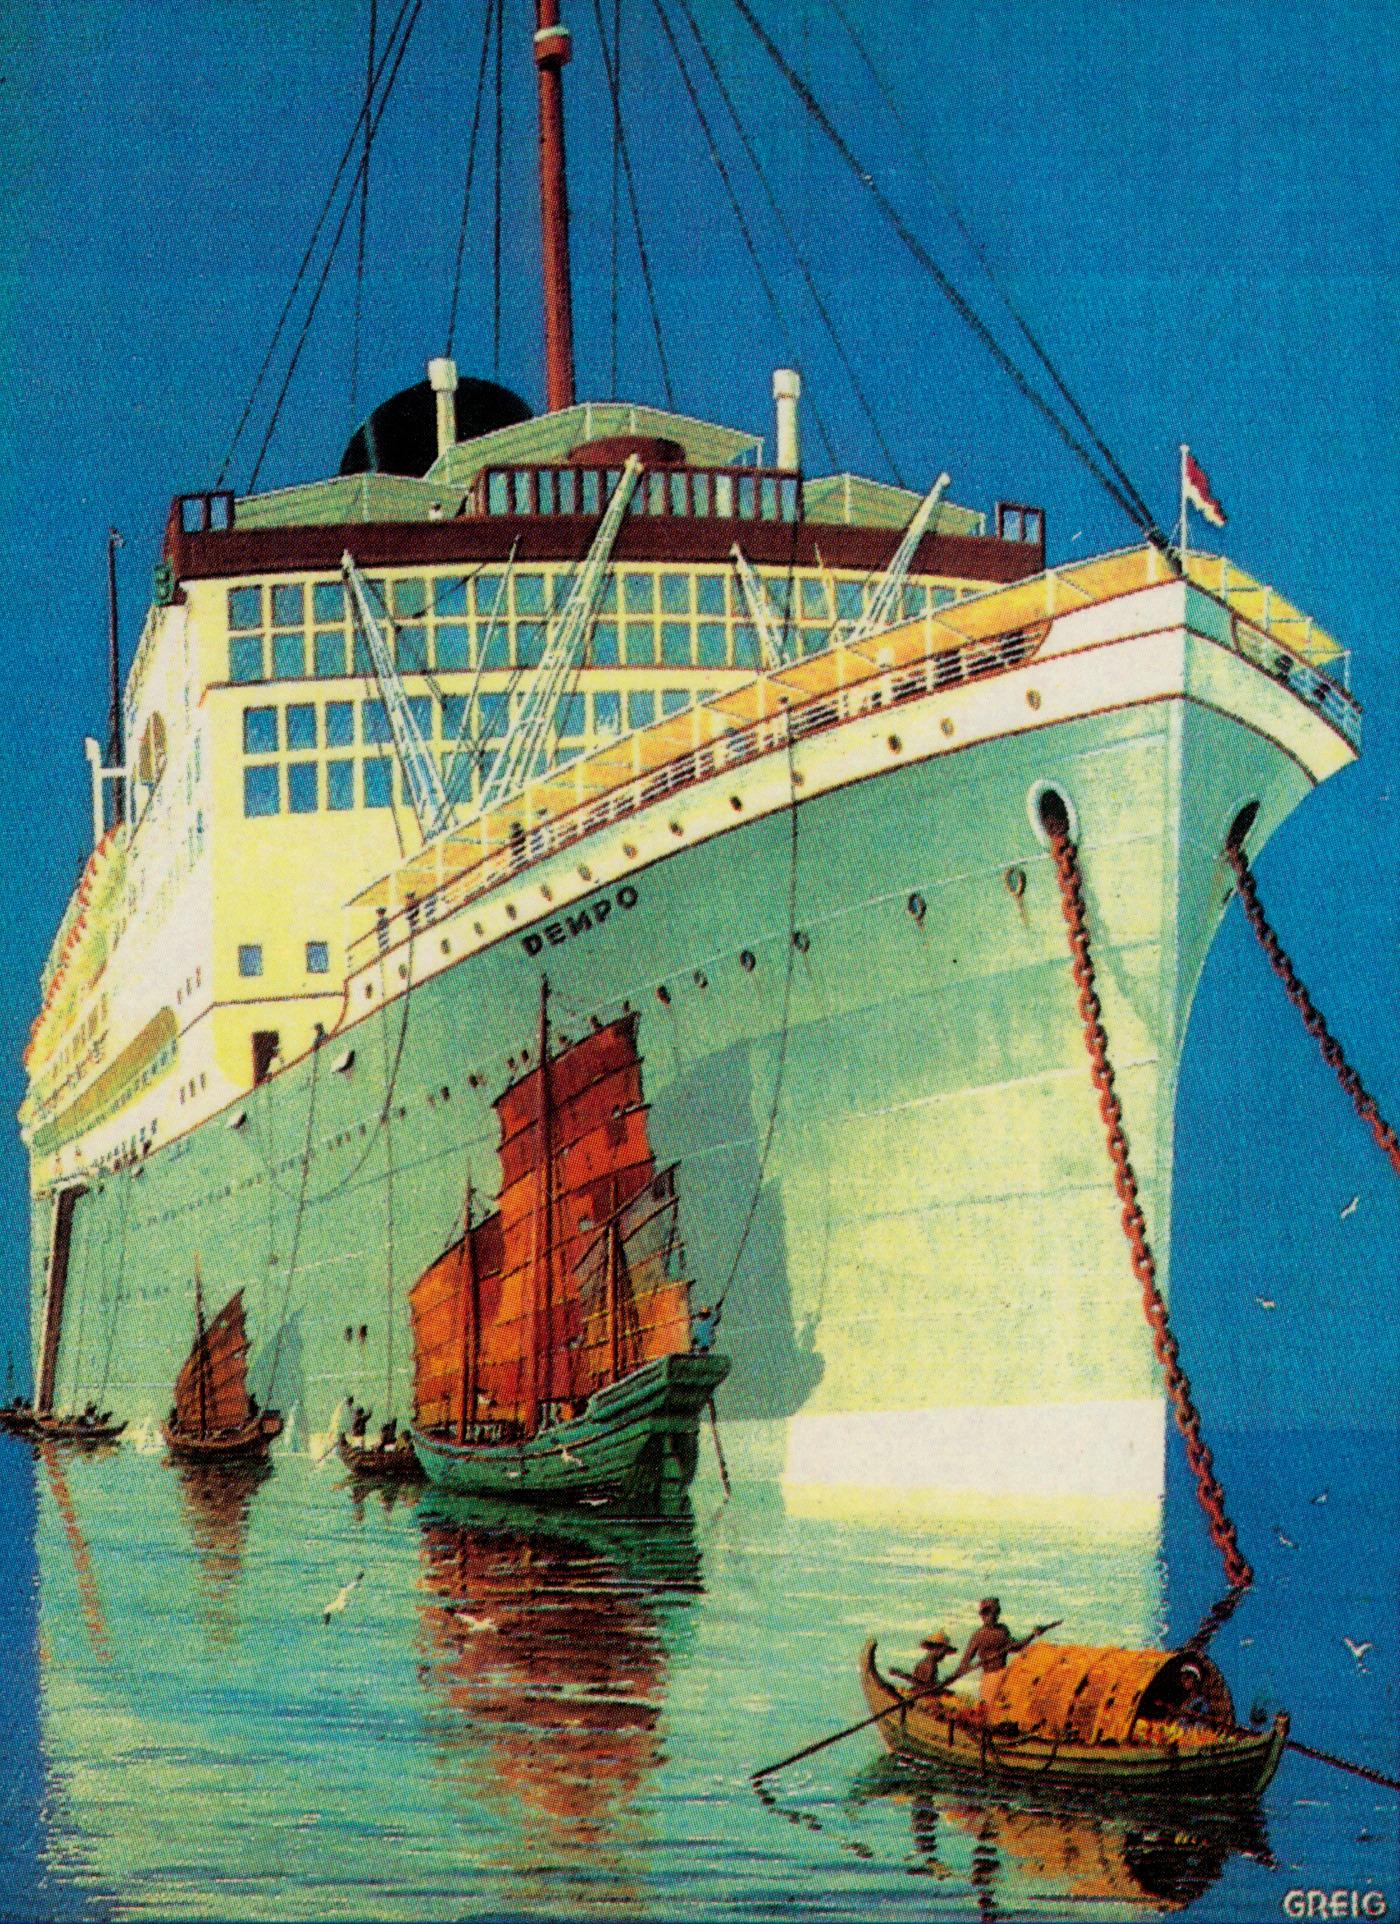 Poster van passagiersschip